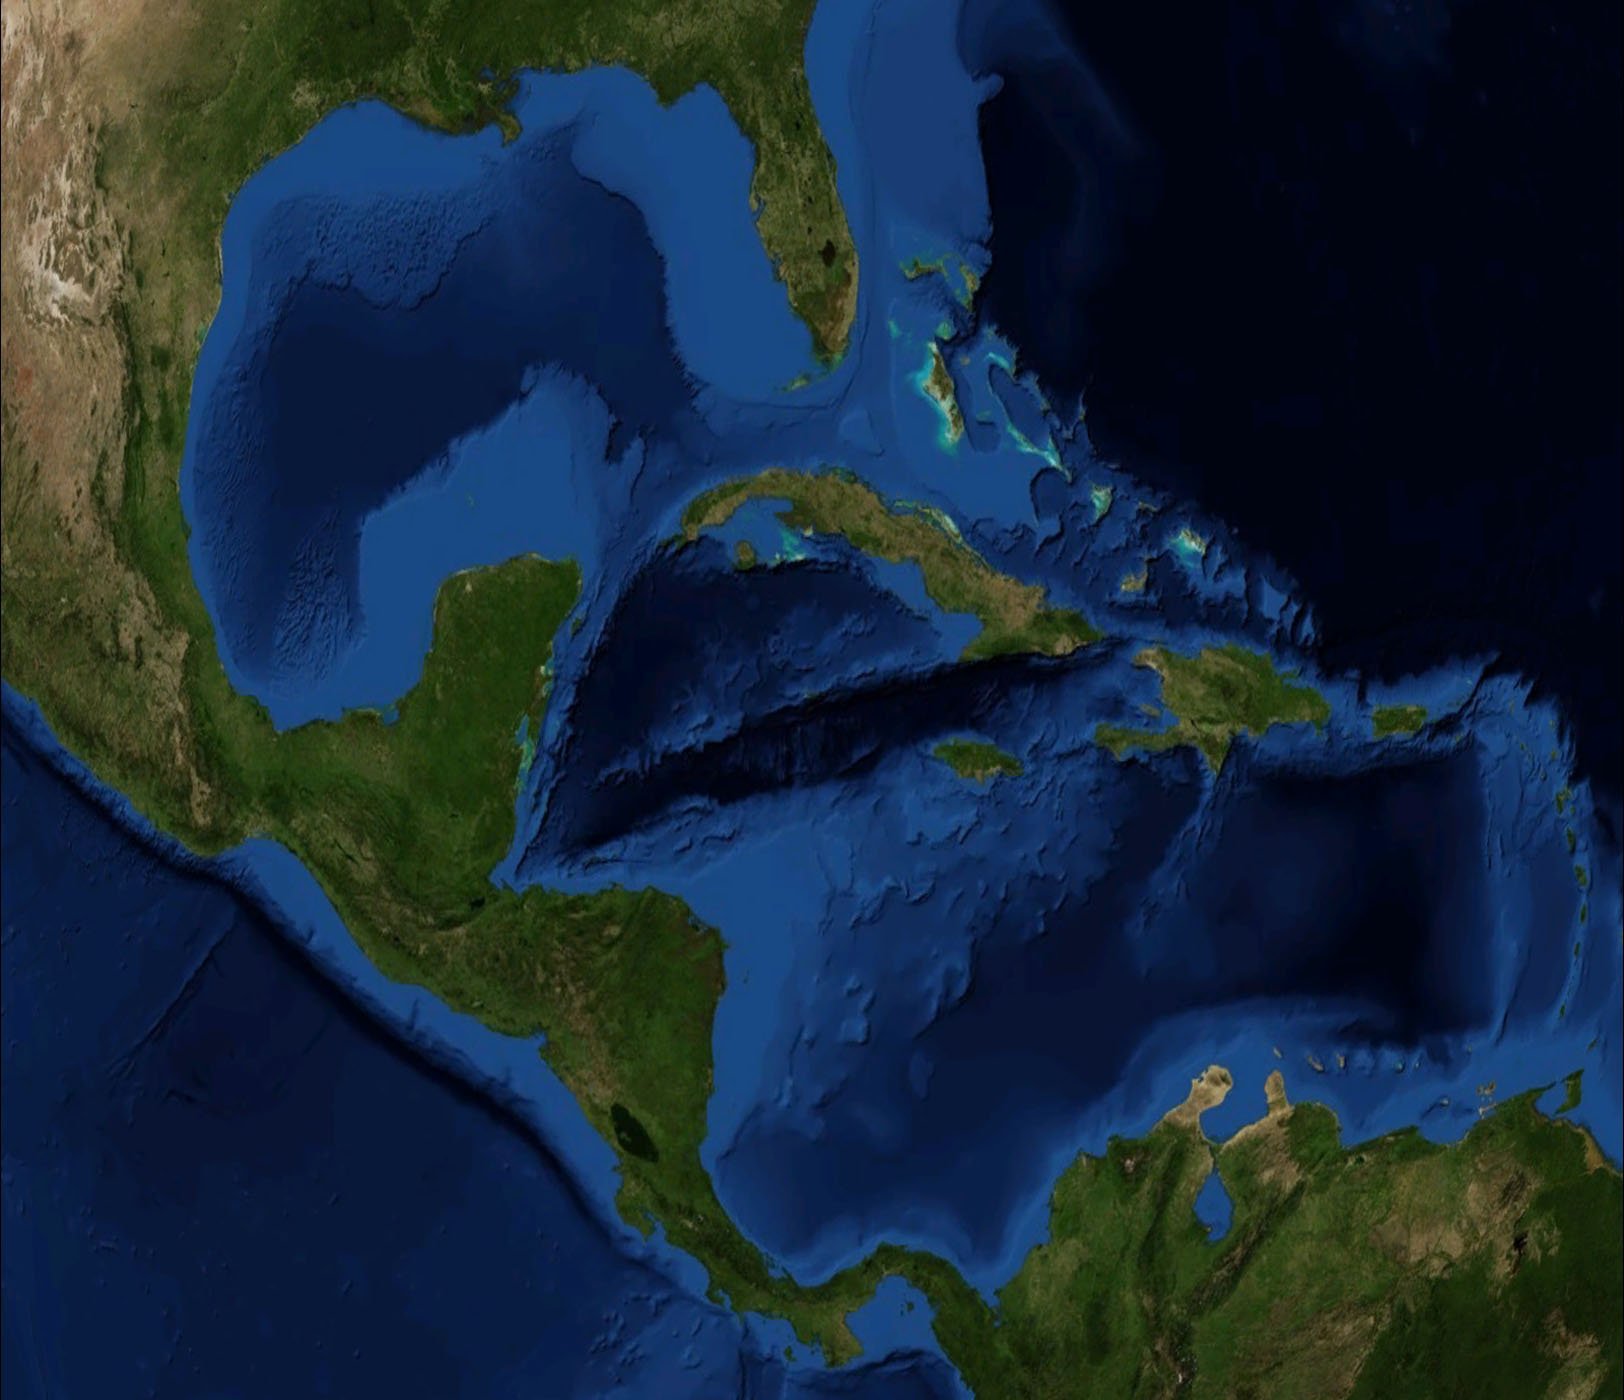 C. America & the Caribbean